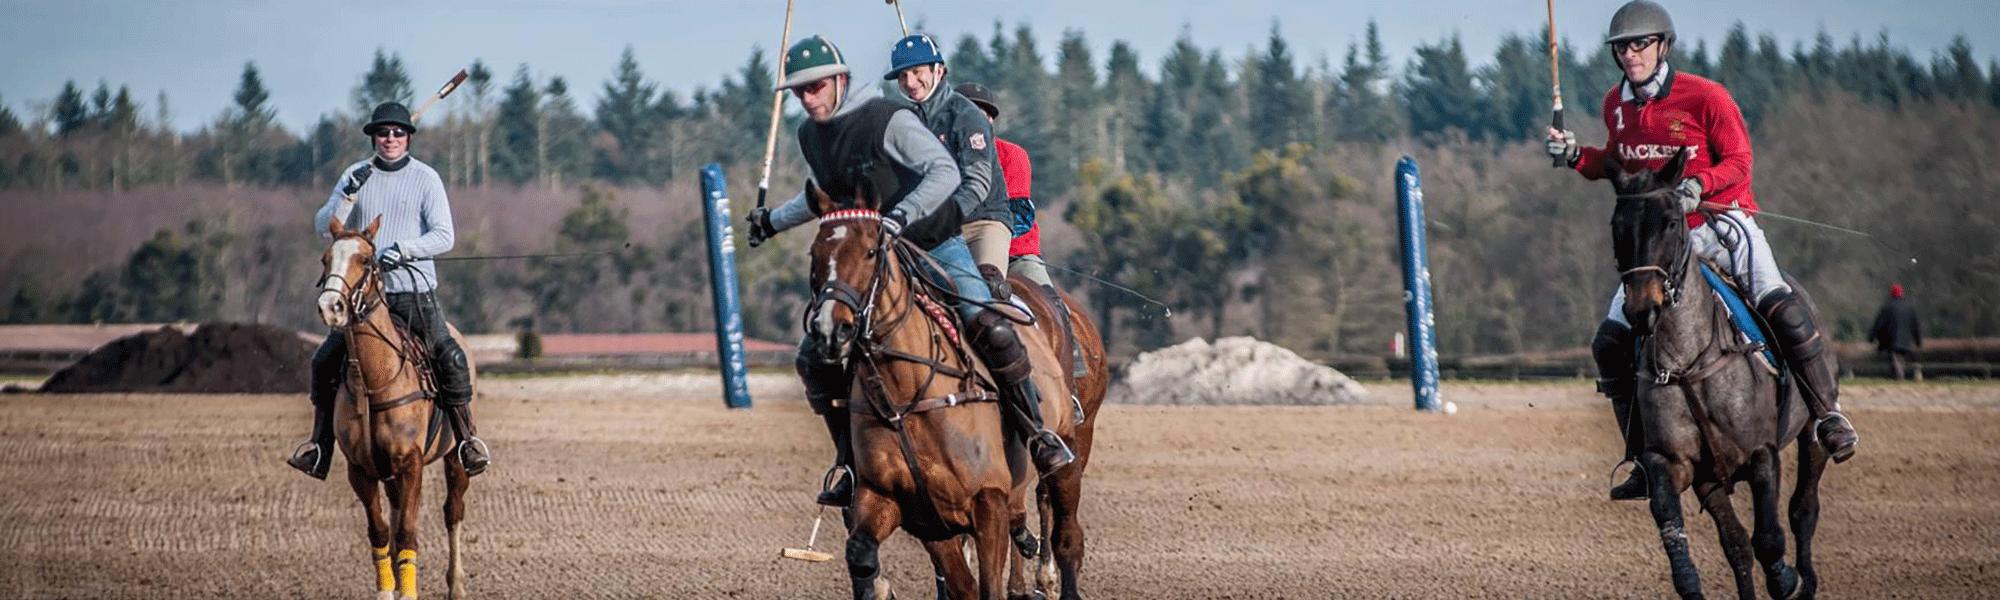 initiation_polo_equitation